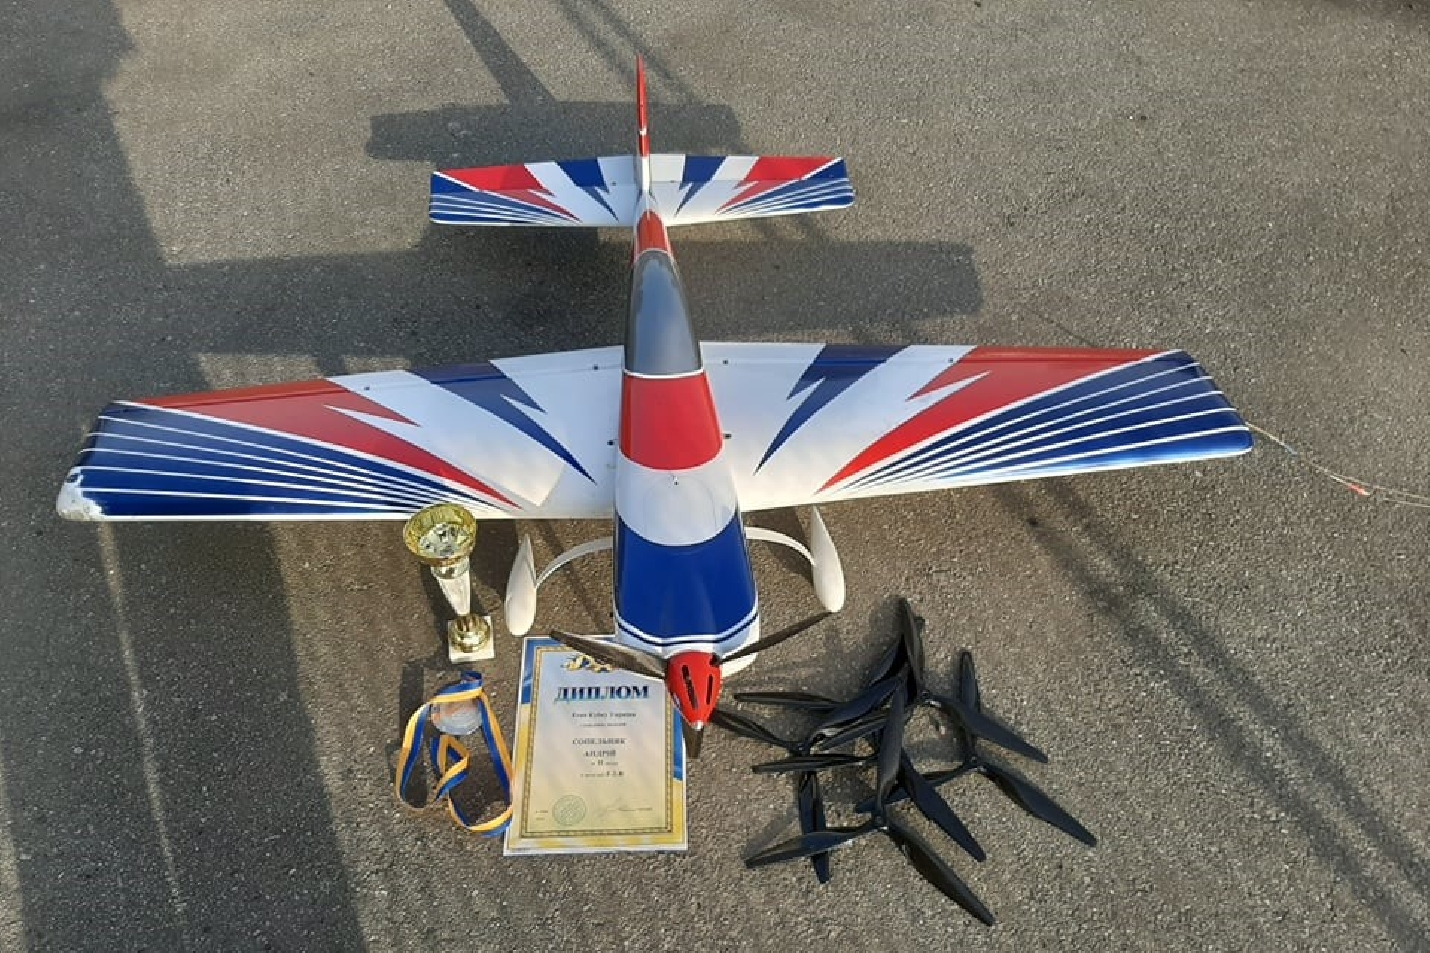 F2B carbon propeller